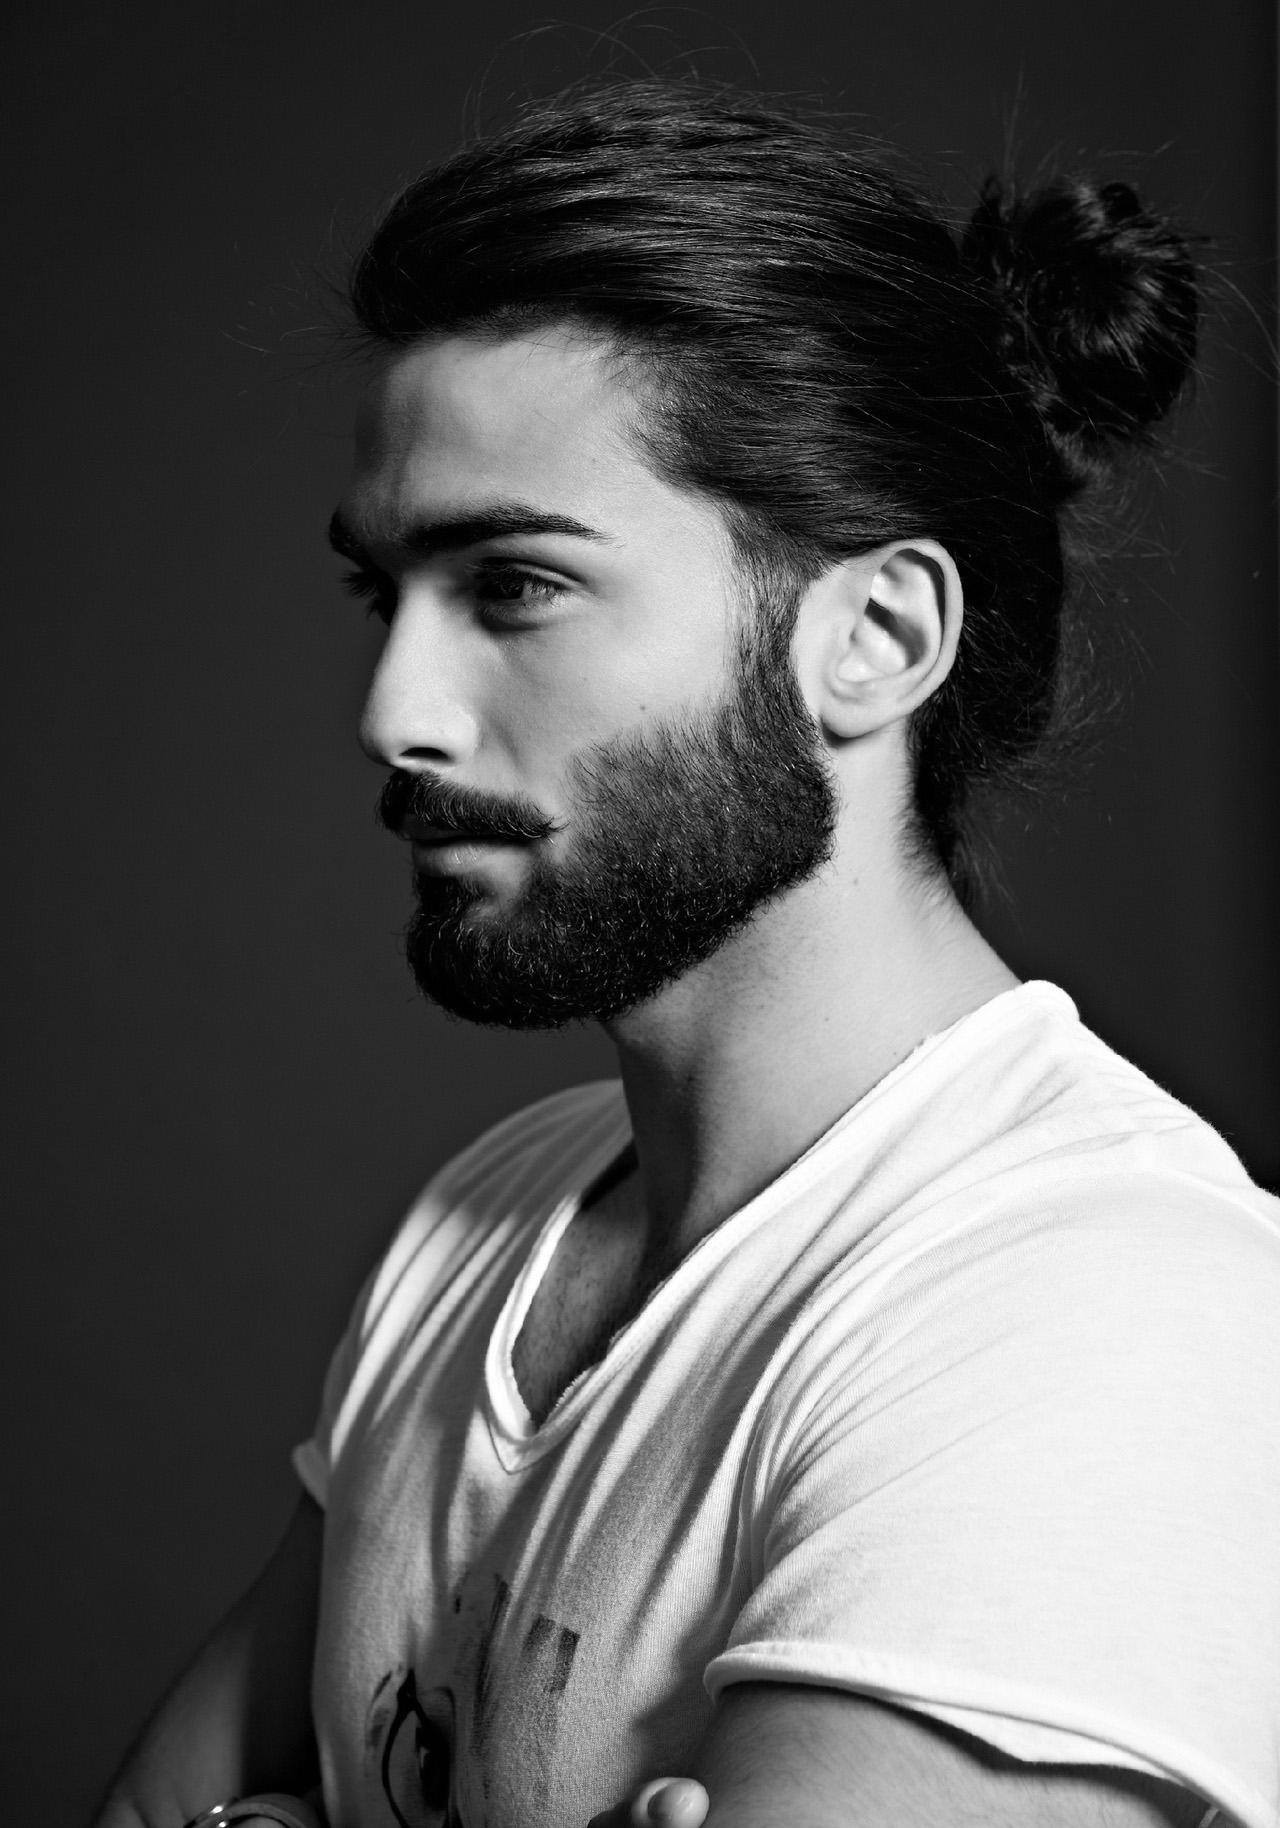 4 Gaya Rambut Pria Terbaik   Perawatannya! – Blog Bhinneka ff9b5ffe8d